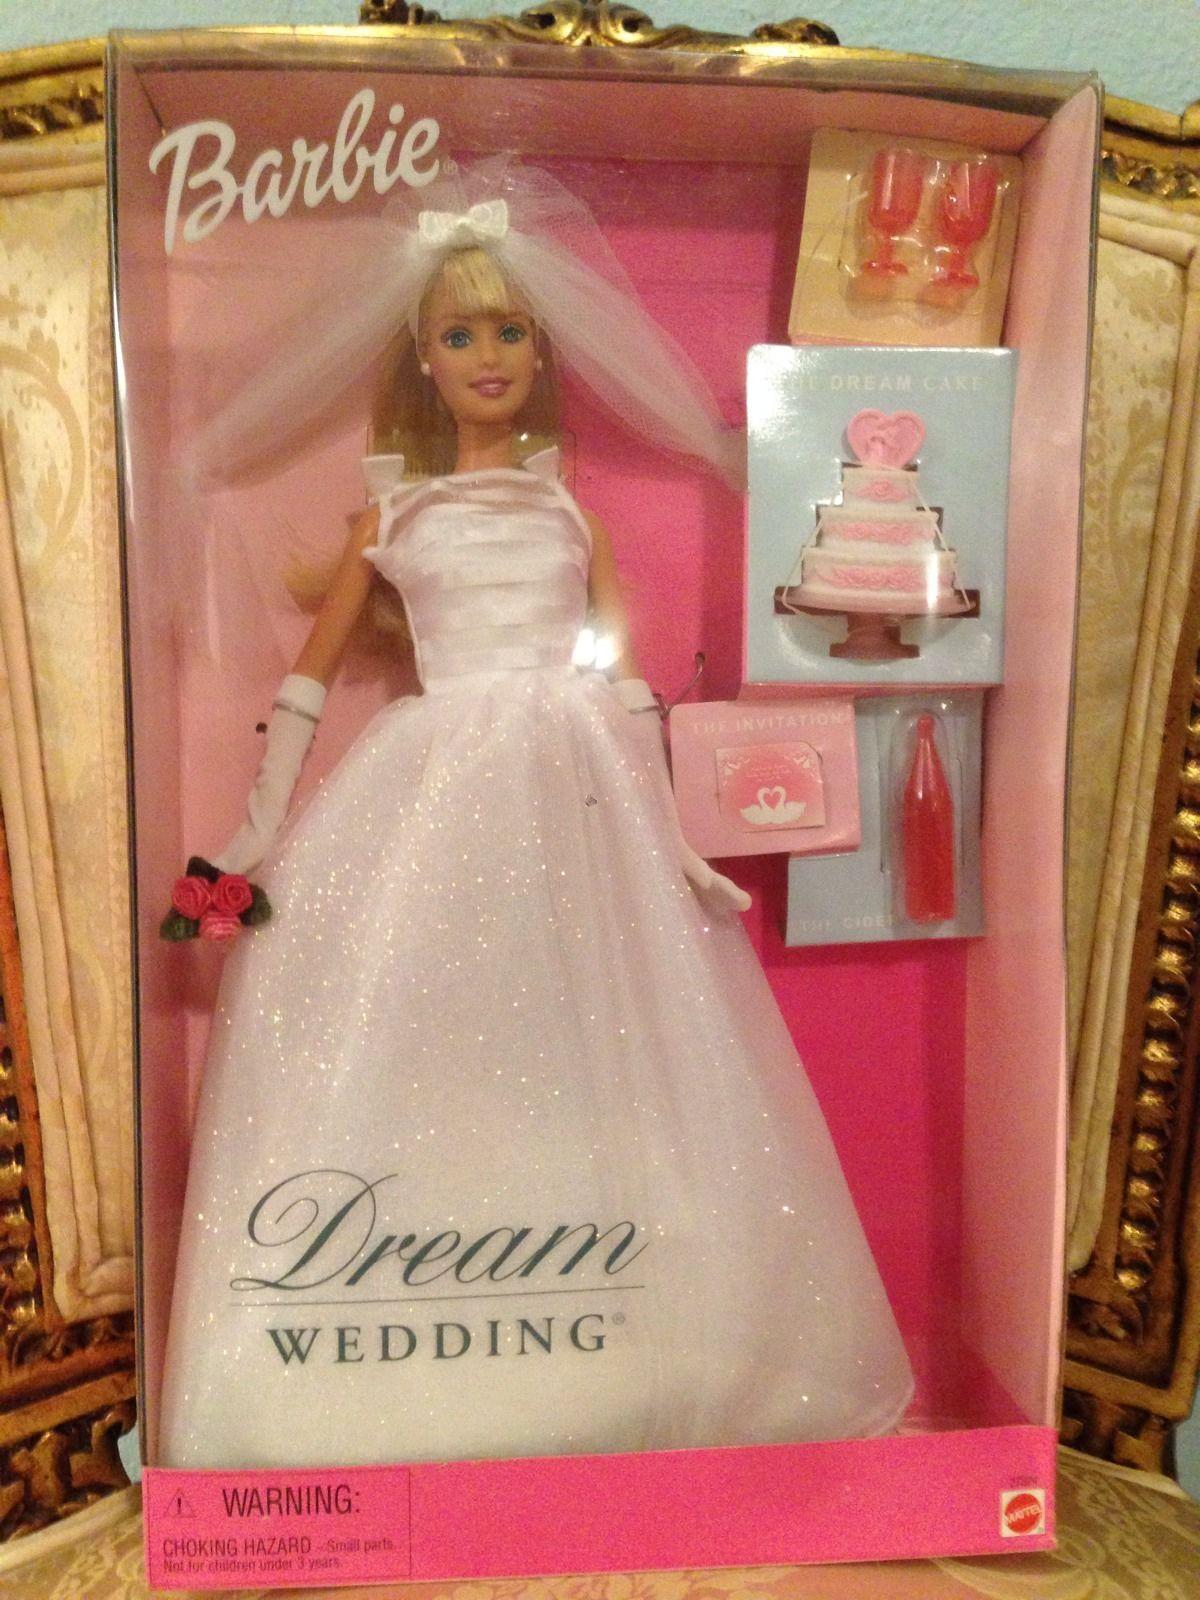 Barbie 2000 Dream Wedding Doll New In Box Cake Invitation Champagne Ebay